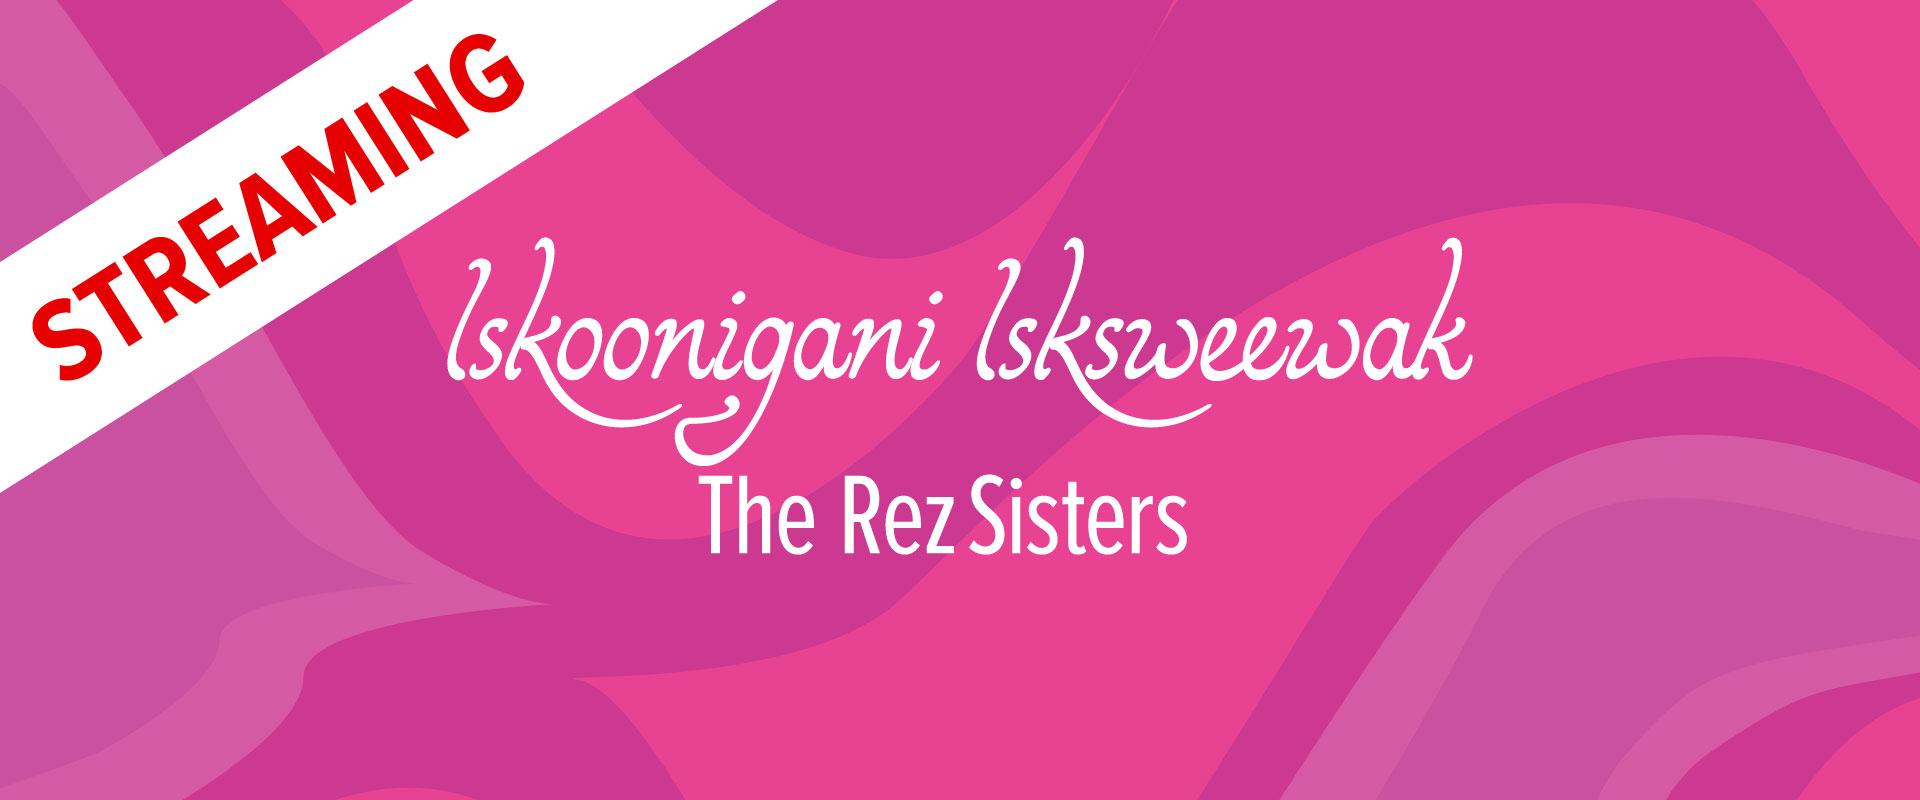 Wordmark image of lskoonigani lsksweewak The Rez Sisters